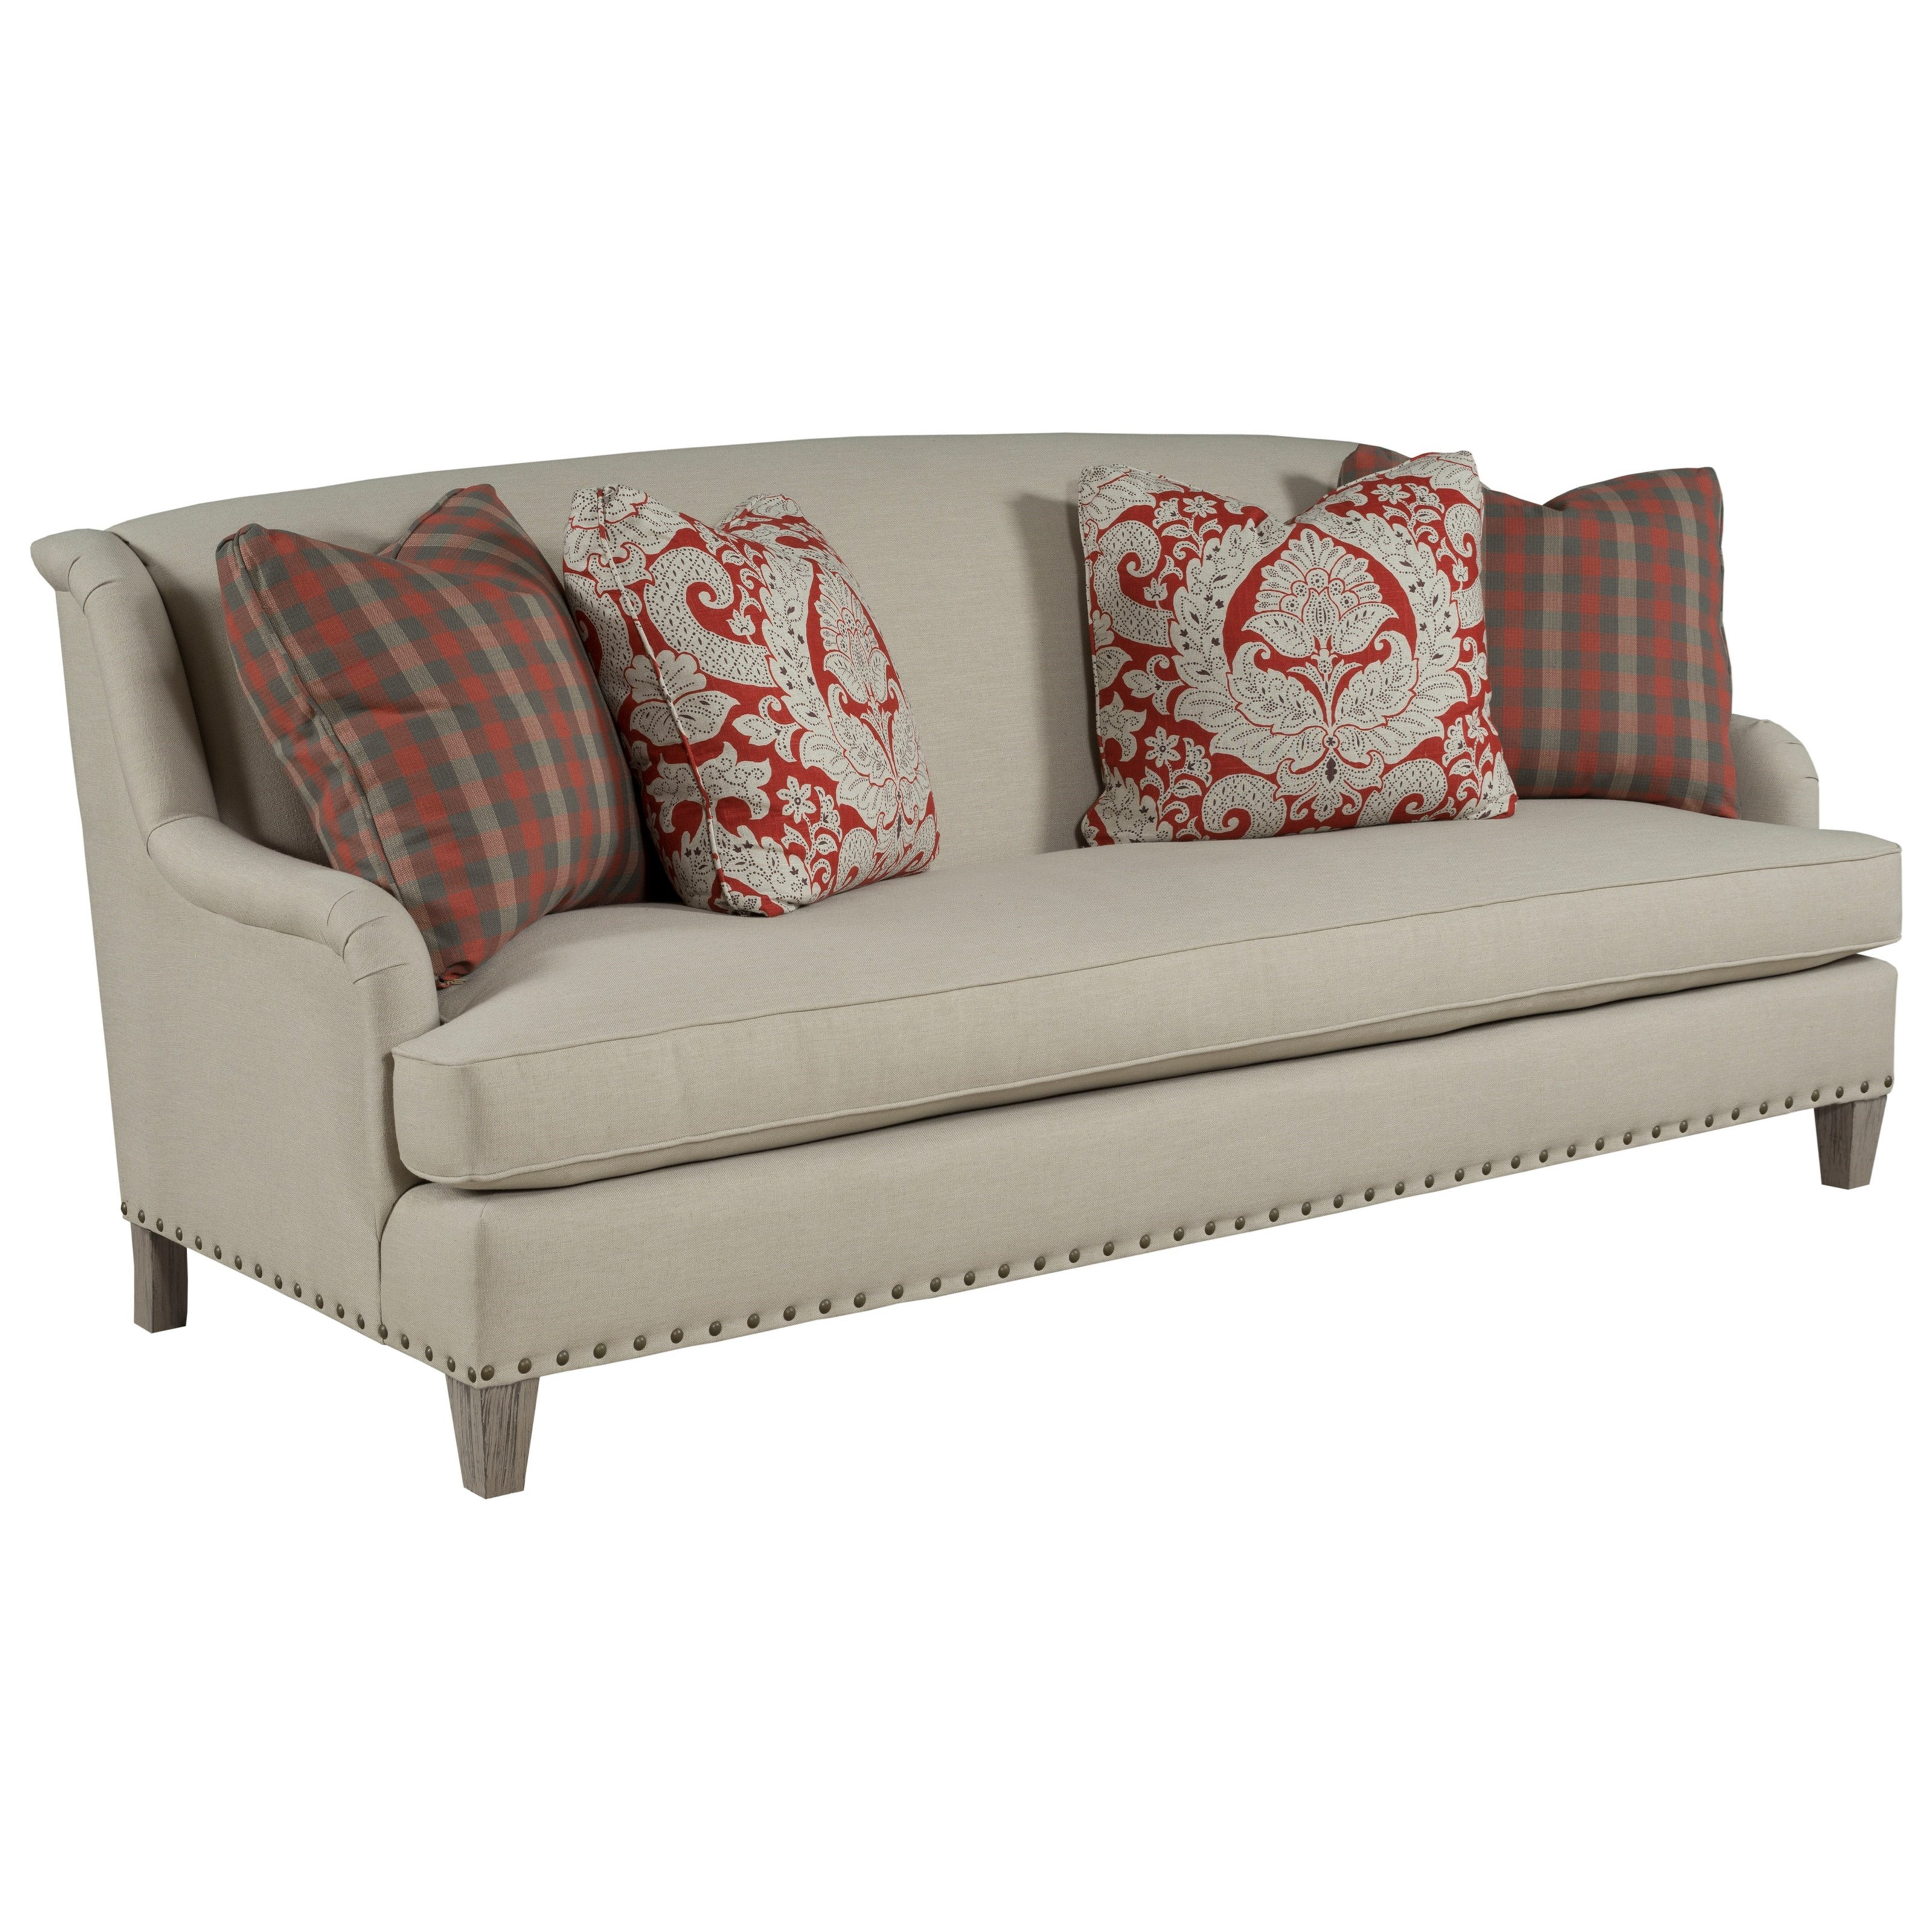 Tuesday Tuesday Sofa by Kincaid Furniture at Johnny Janosik